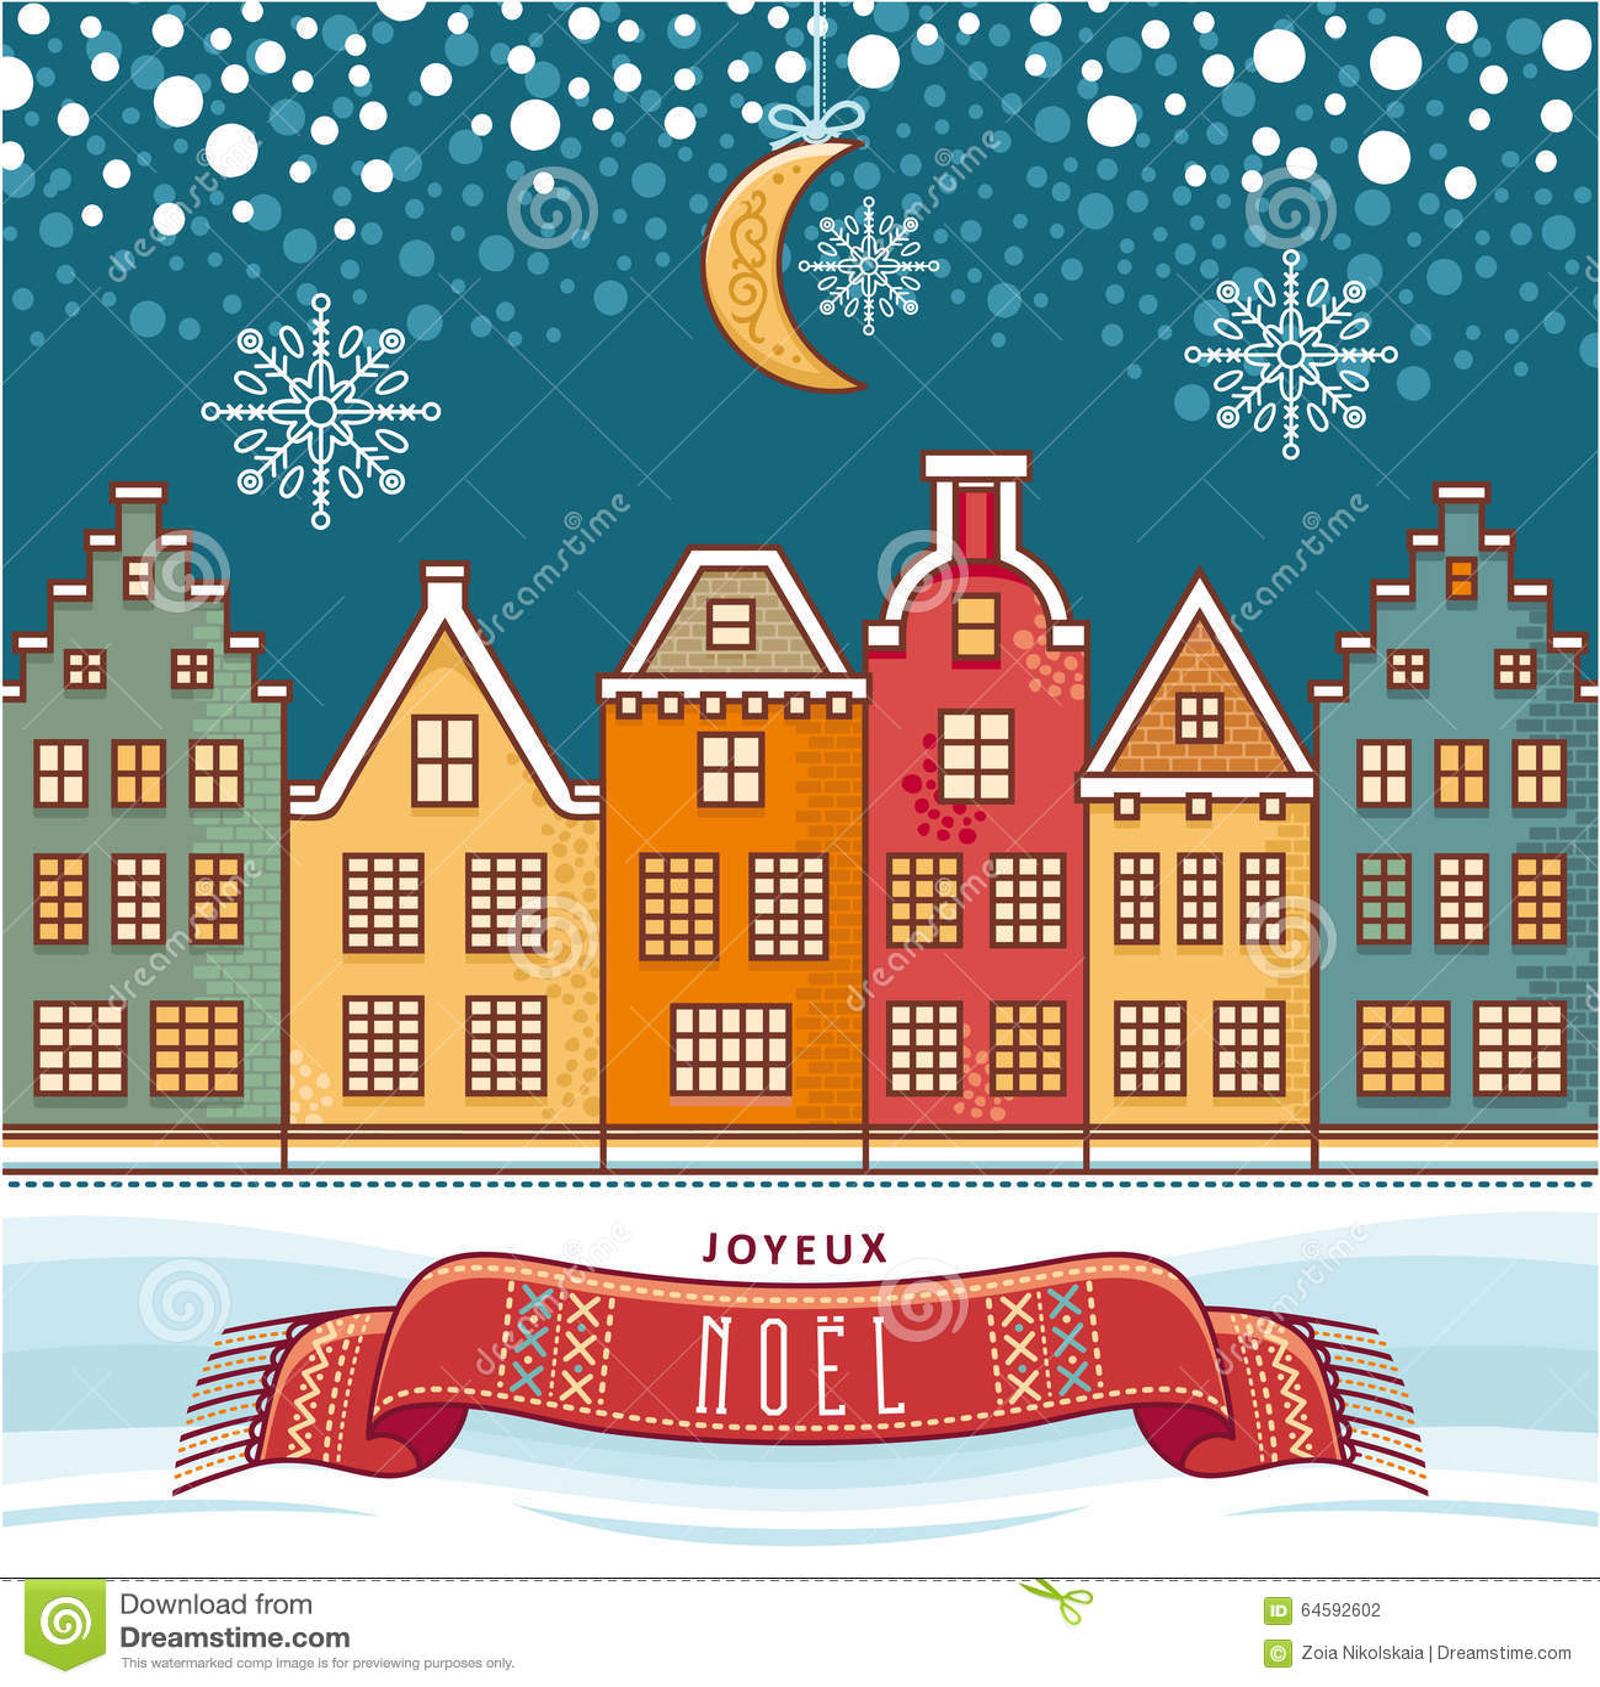 joyeux noel merry christmas in french stock vector. Black Bedroom Furniture Sets. Home Design Ideas